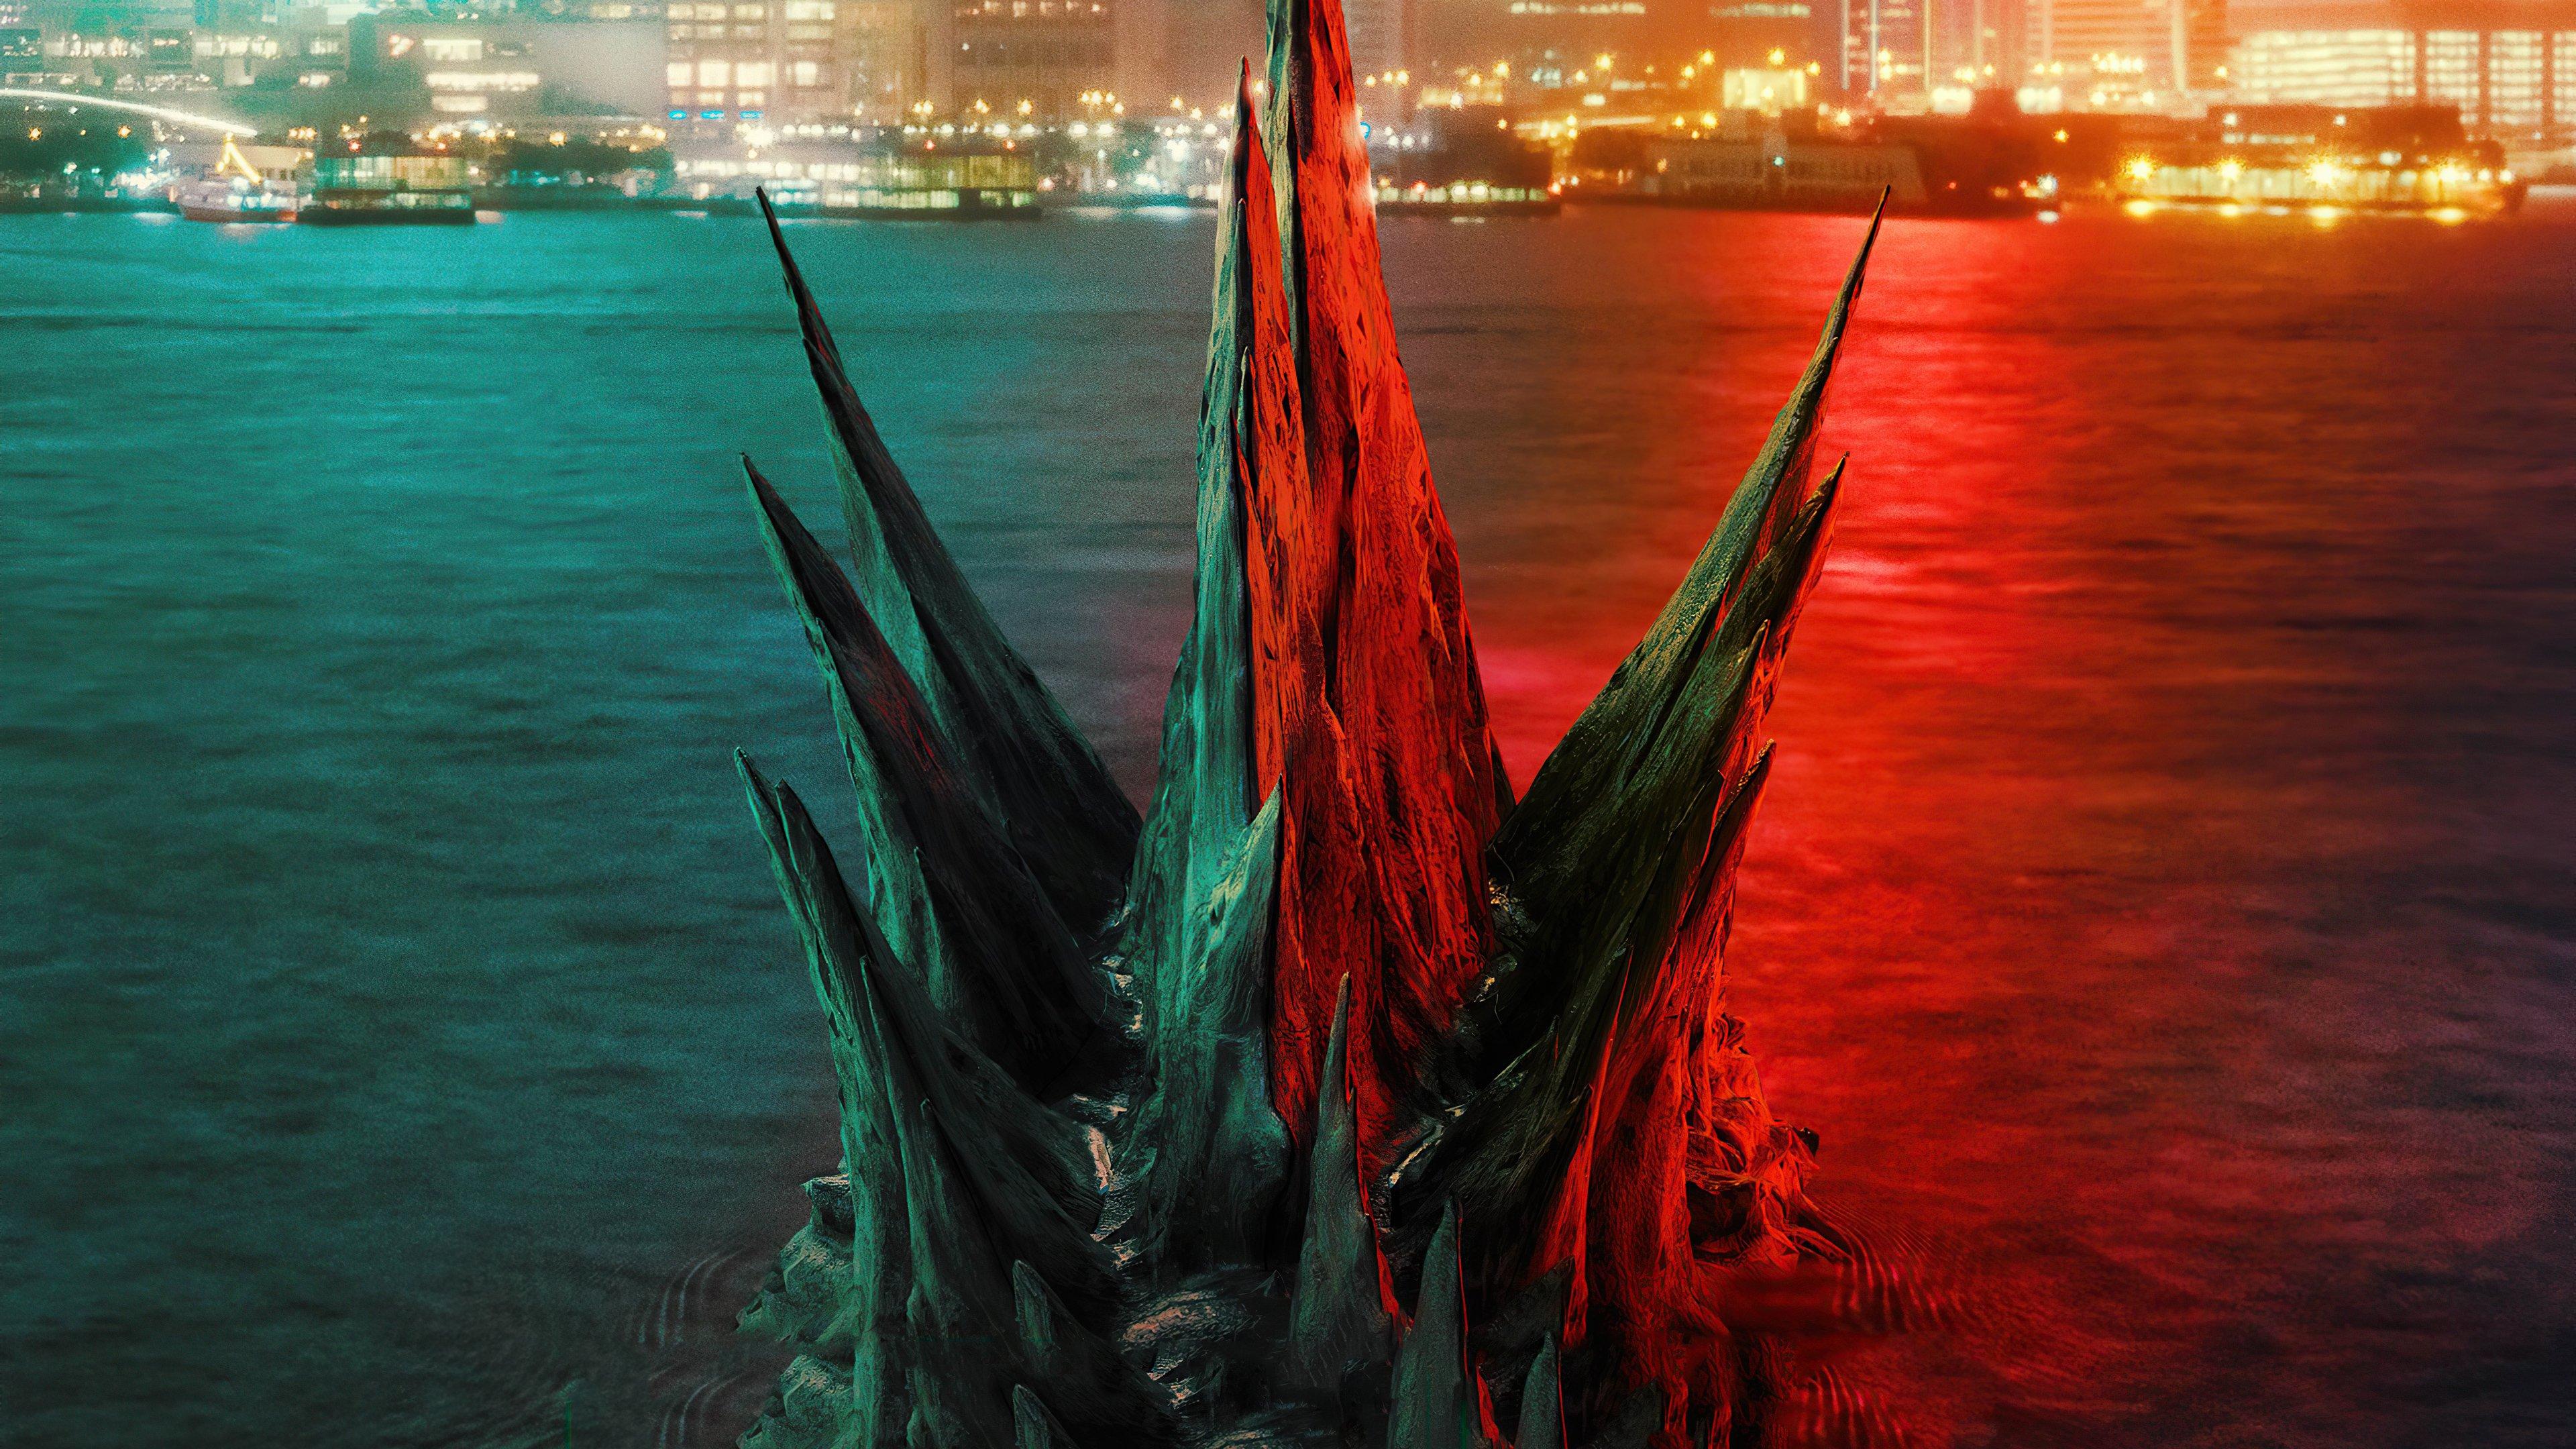 Fondos de pantalla Godzilla vs Kong 2021